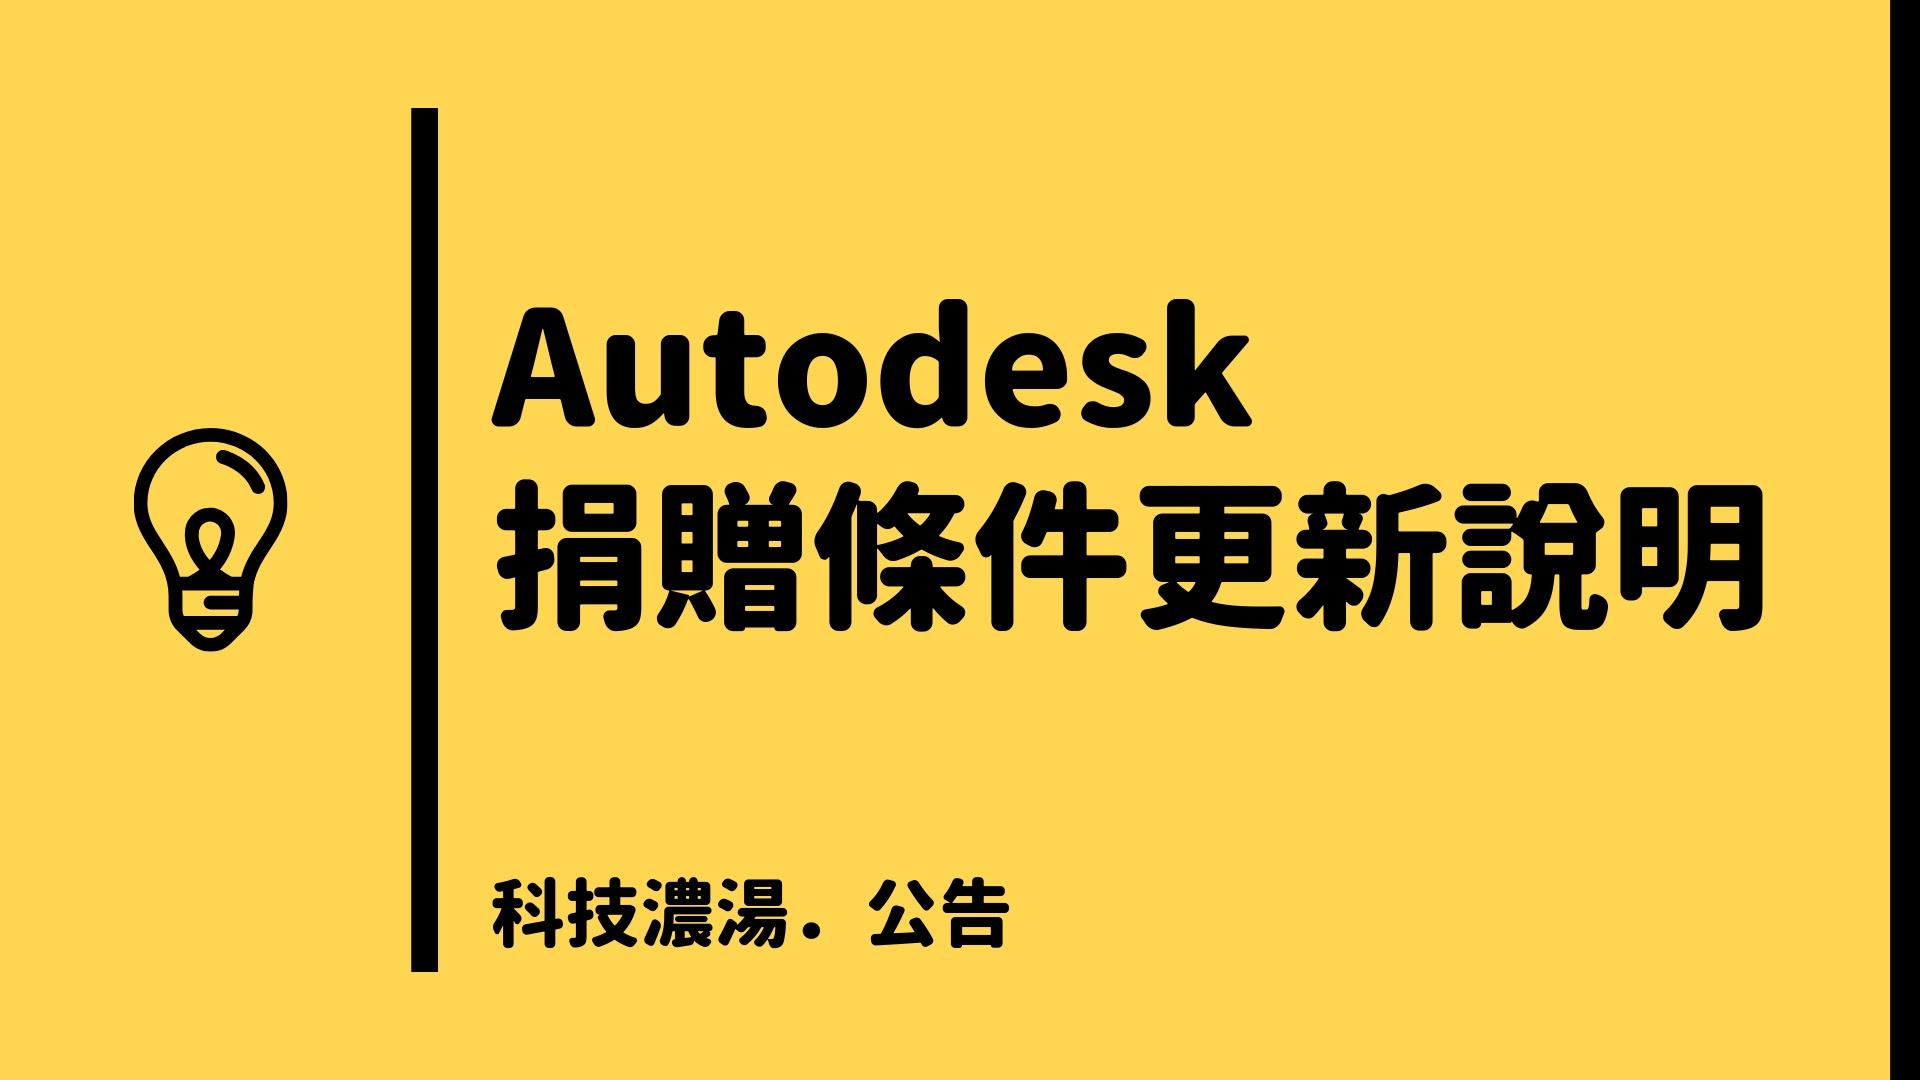 Autodesk 捐贈條件更新說明